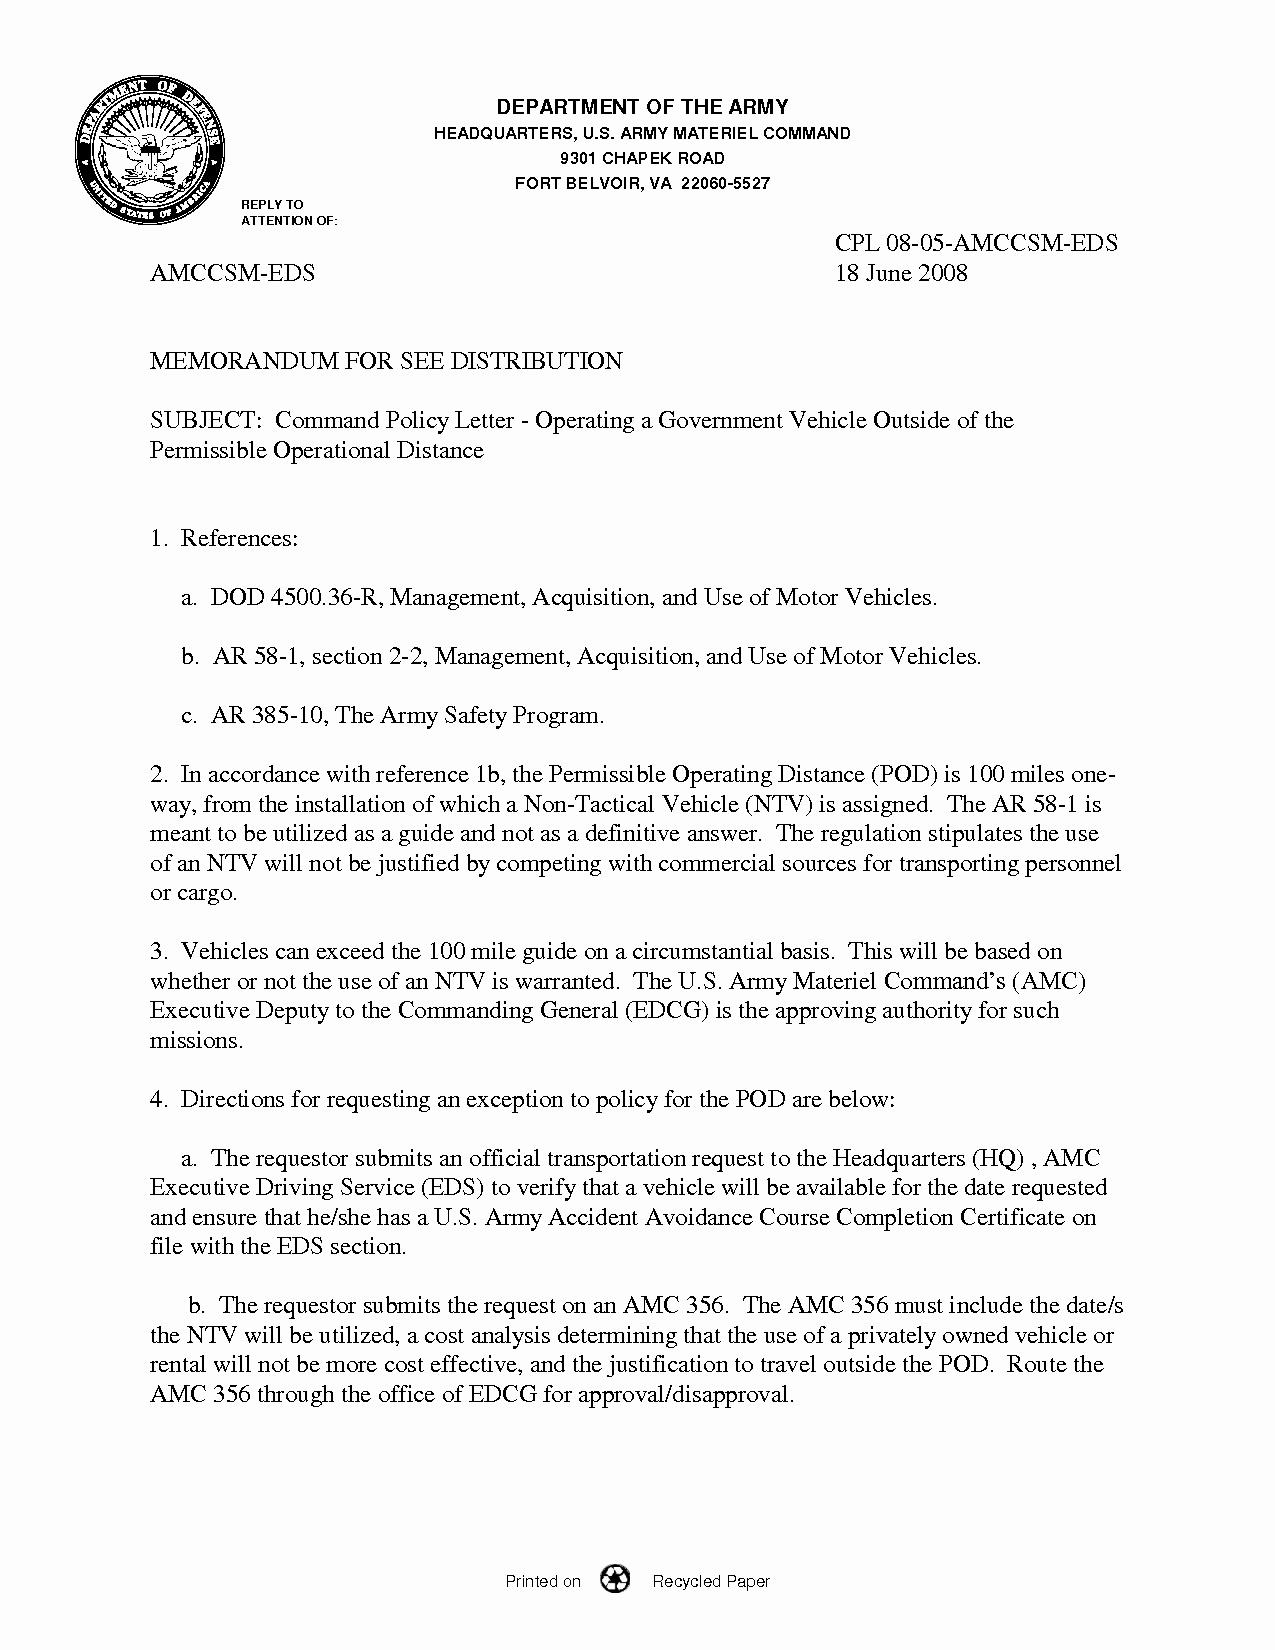 Best S Of U S Army Memorandum Template Army